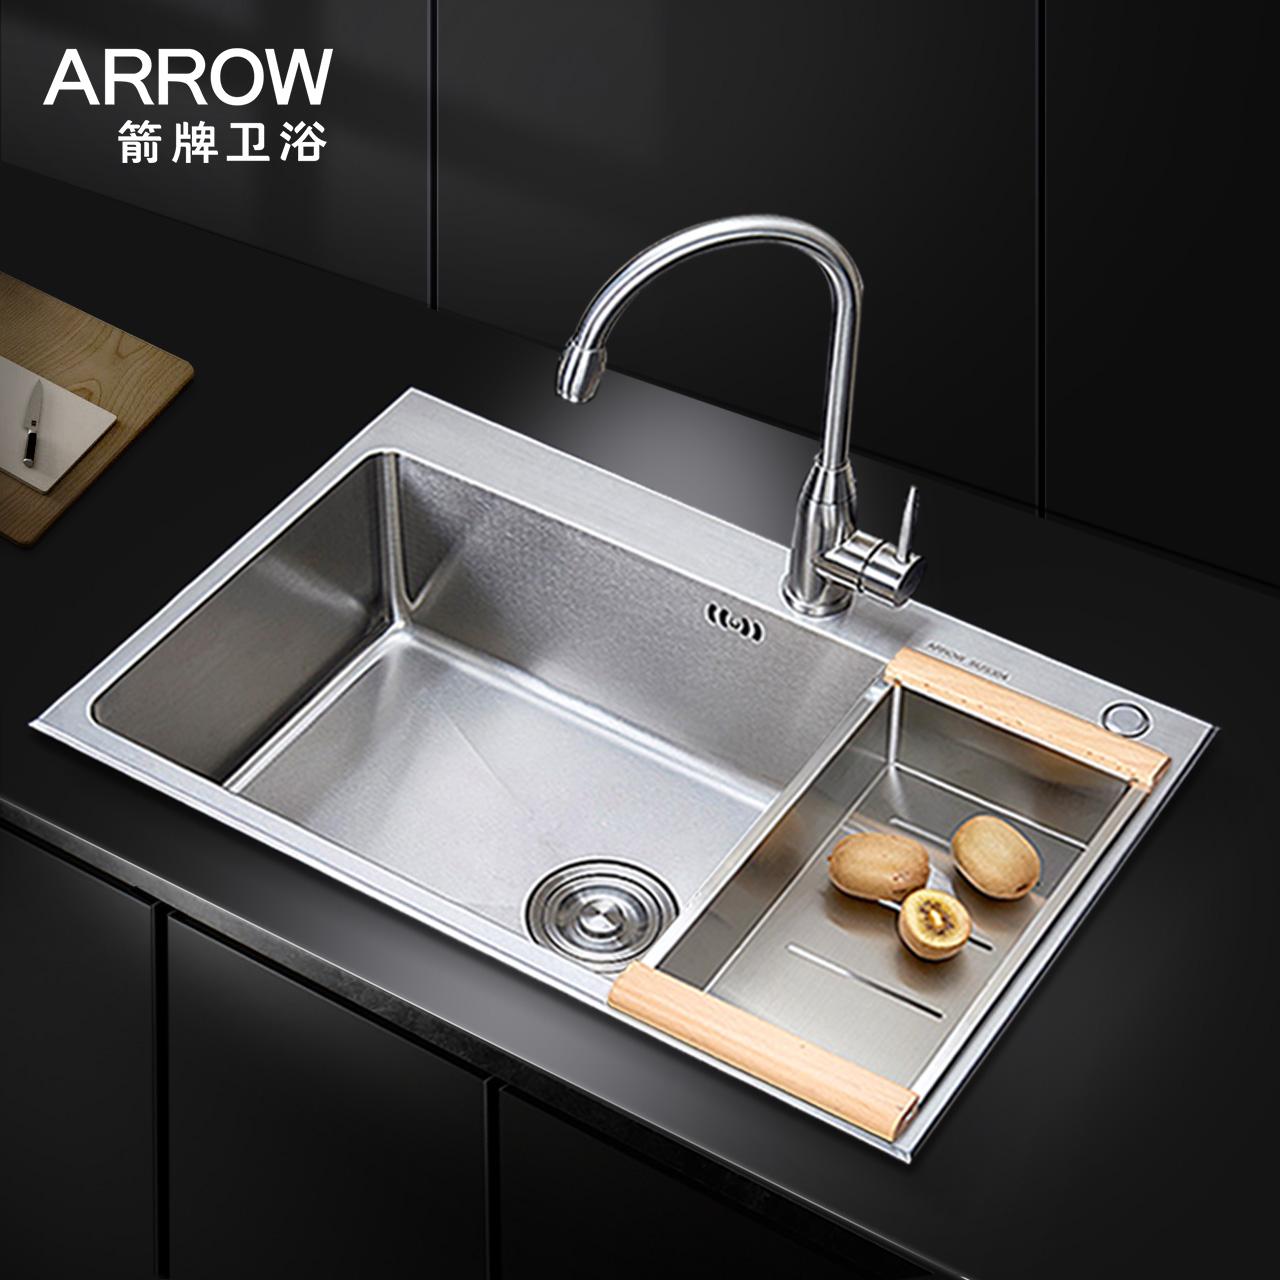 arrow/箭牌水槽 手工不锈钢超大手工单槽套装台下台上厨房洗菜盆